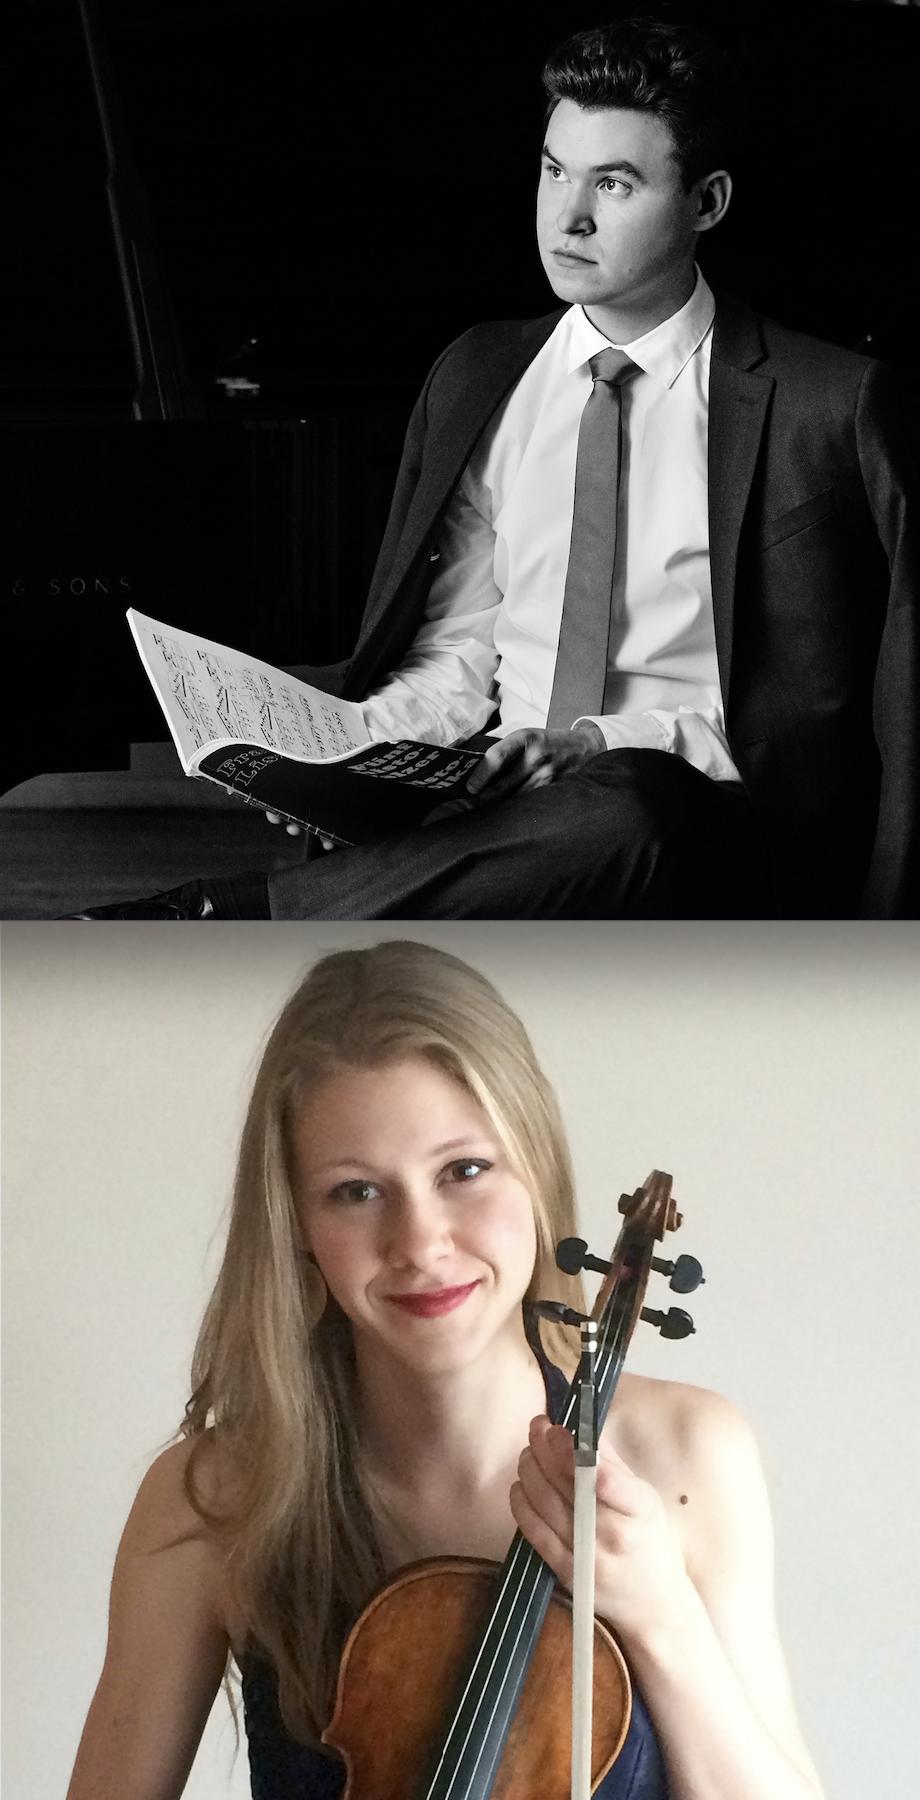 DE FALLA Suite Populaire EspagnoleDVORAK Four Romantic Pieces, Op. 75CHOPIN-KREISLER Mazurka in A MinorMatthew Graybil, pianoRhiannon Banerdt, violin -